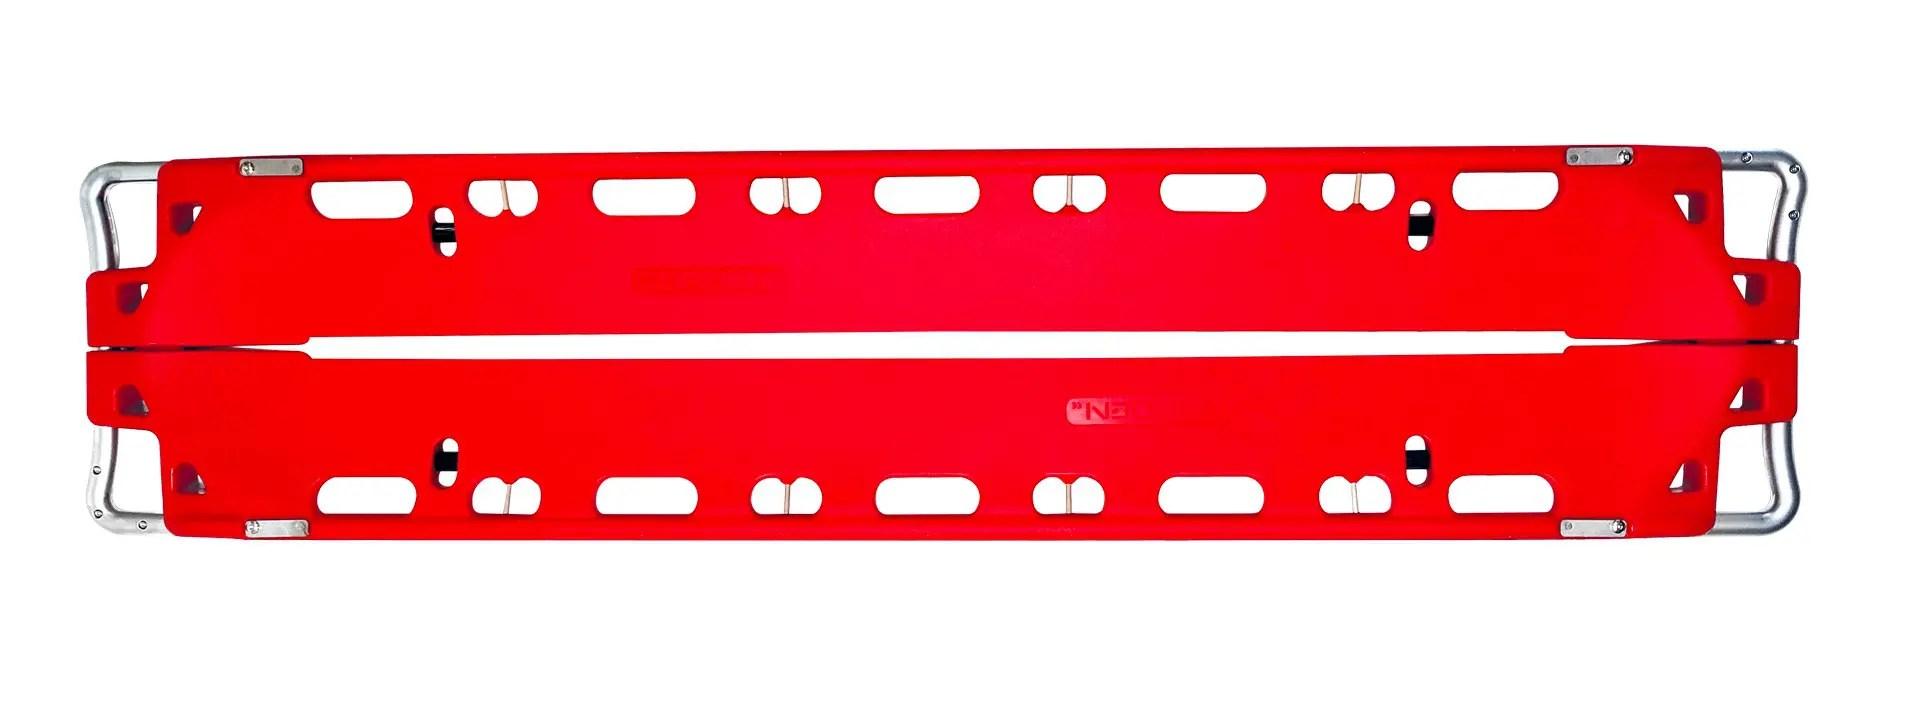 CD Plast Engineering accompagne Corben dans la création de sa civière innovante 2 en 1